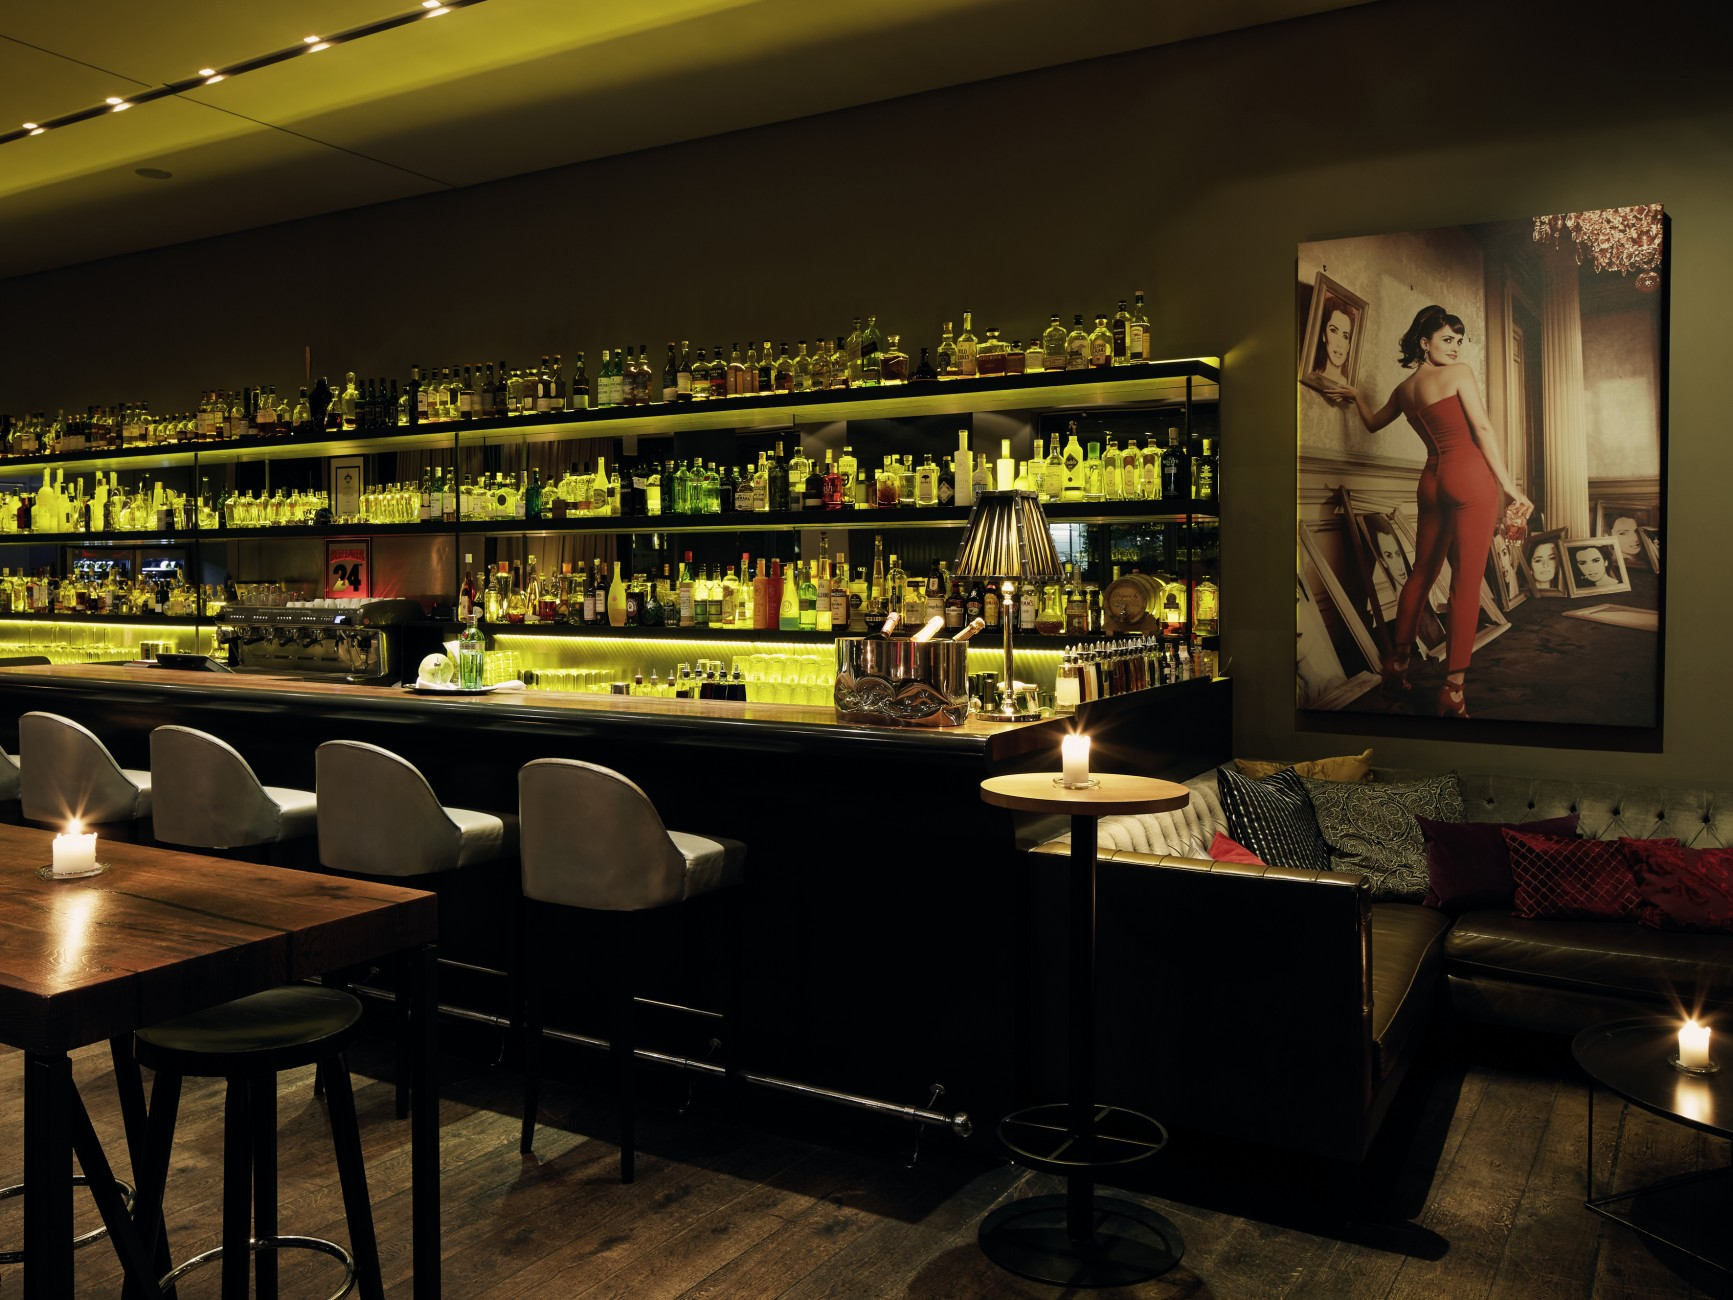 Stylishe Cocktailbar In Hamburg Mit Dachterrasse Bar Dacaio An Der